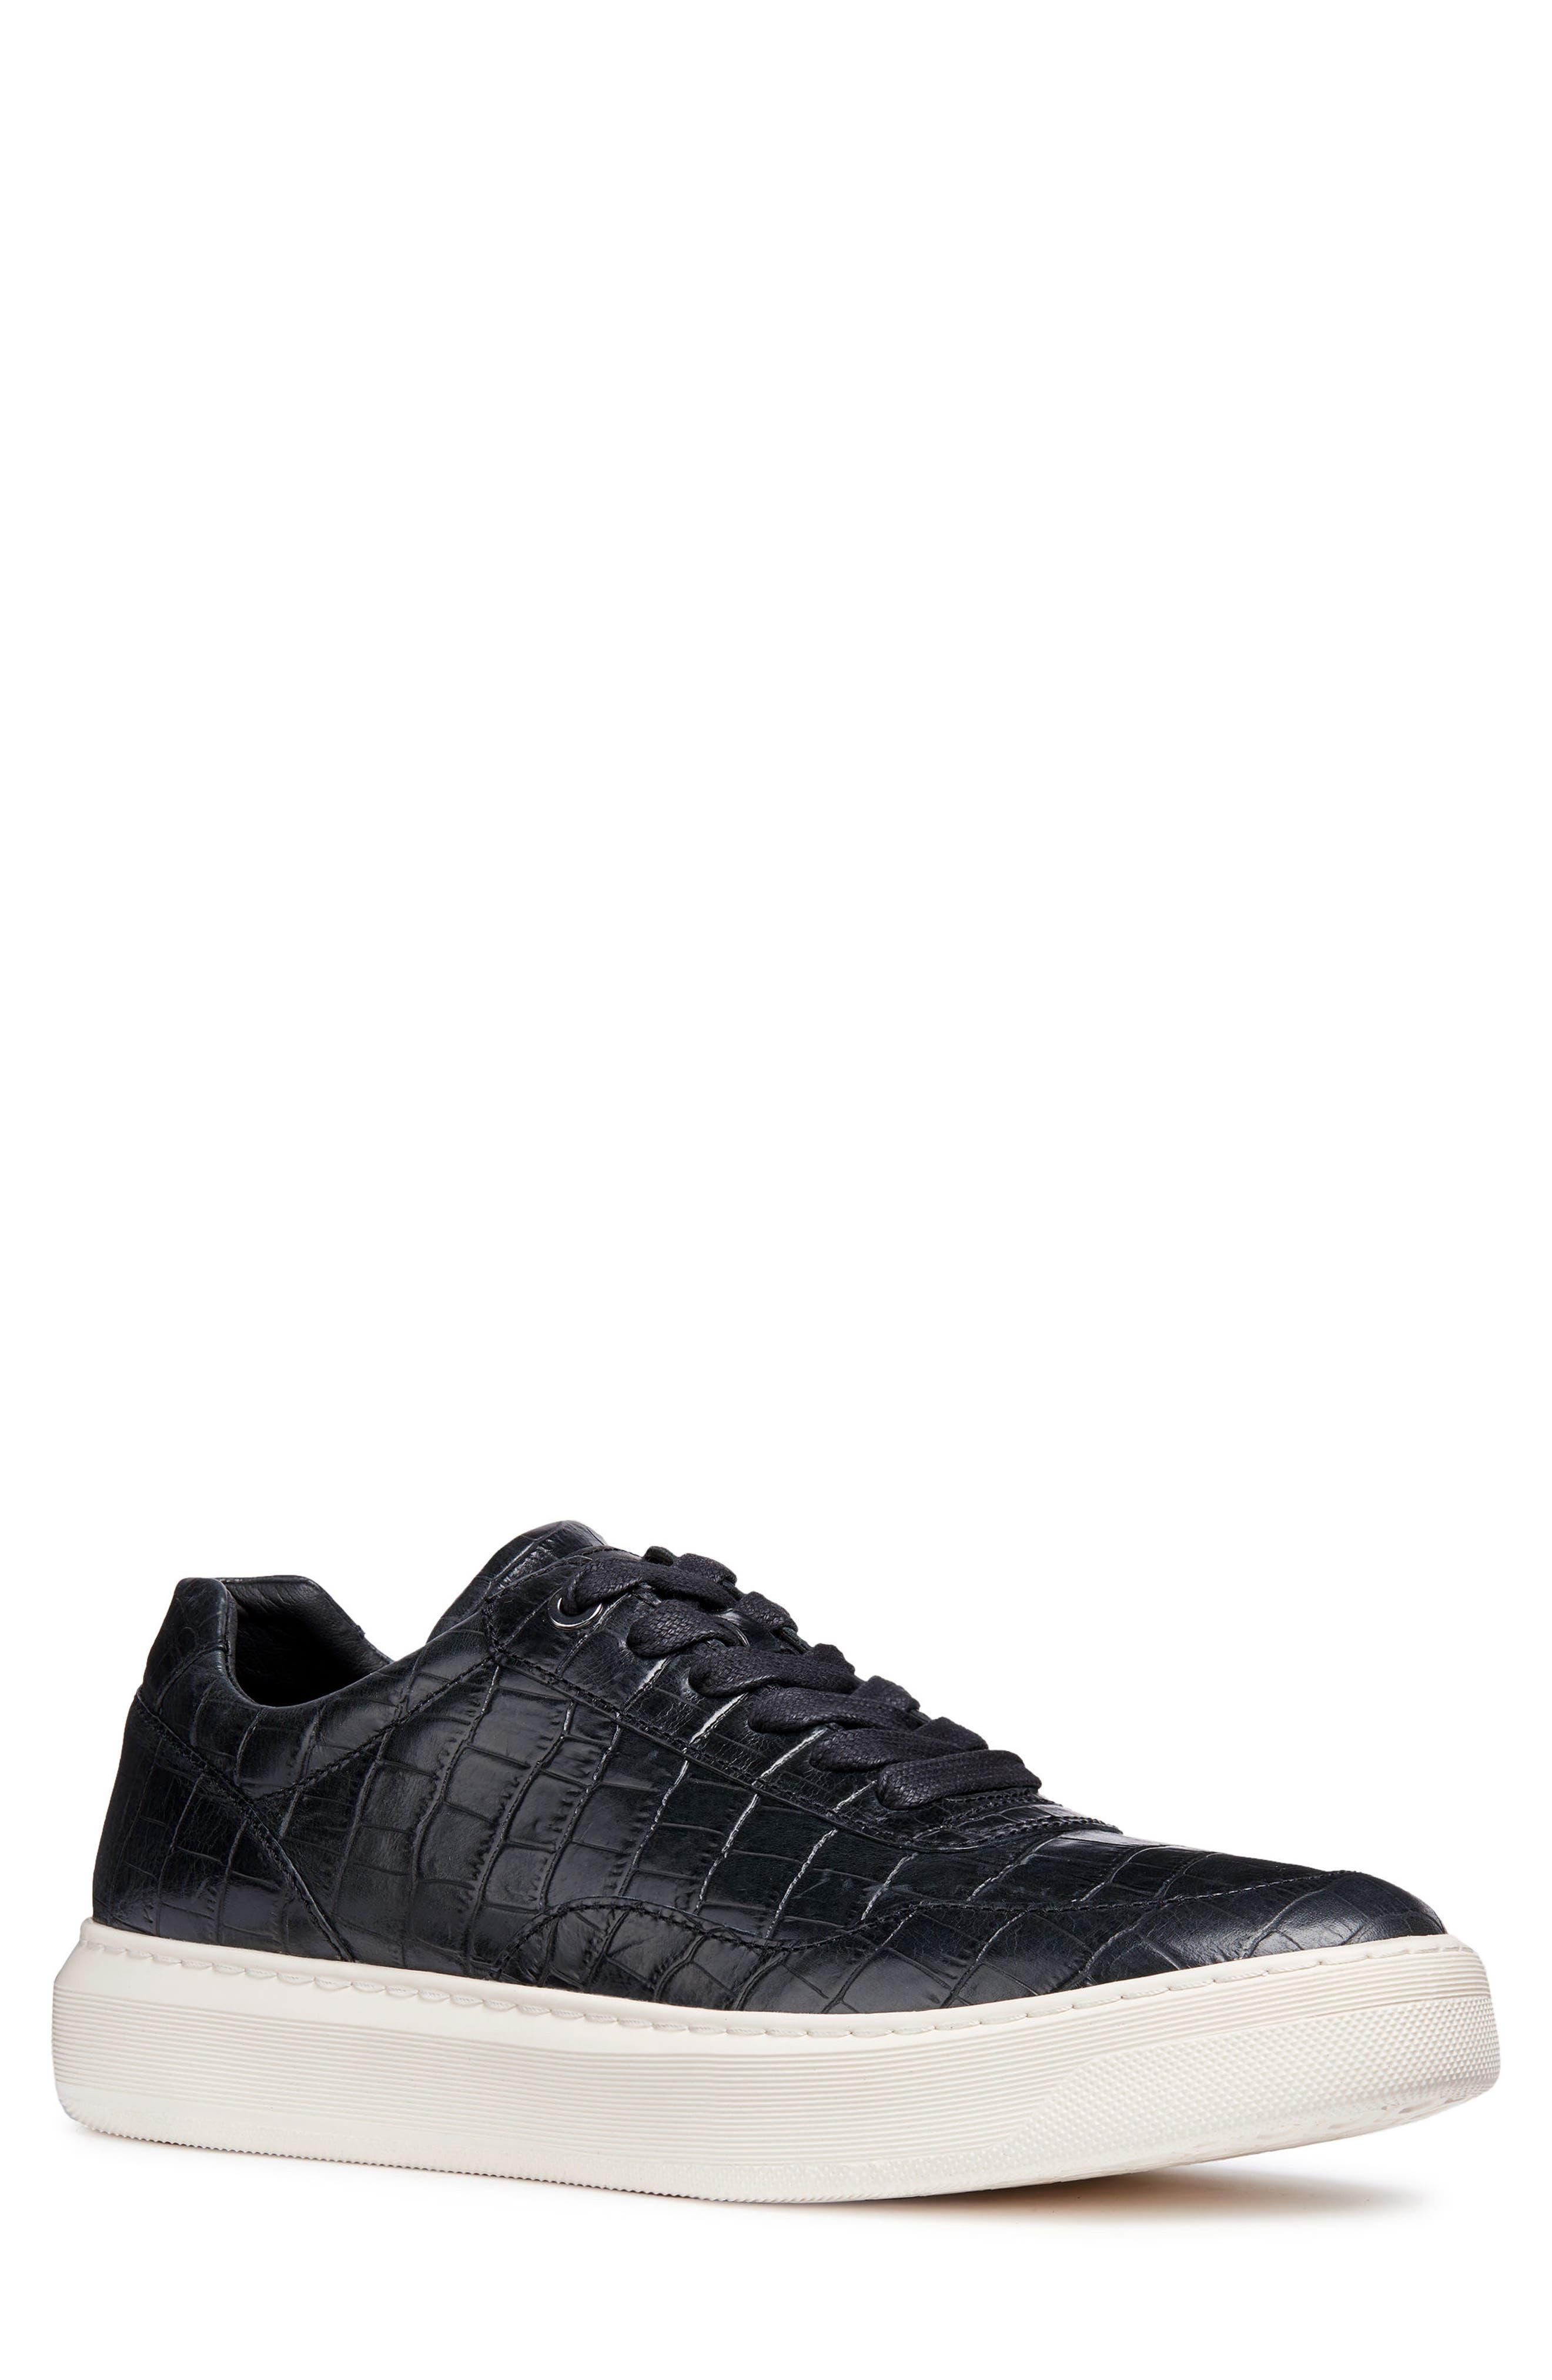 Deiven 8 Croc Textured Low Top Sneaker,                             Main thumbnail 1, color,                             BLACK LEATHER